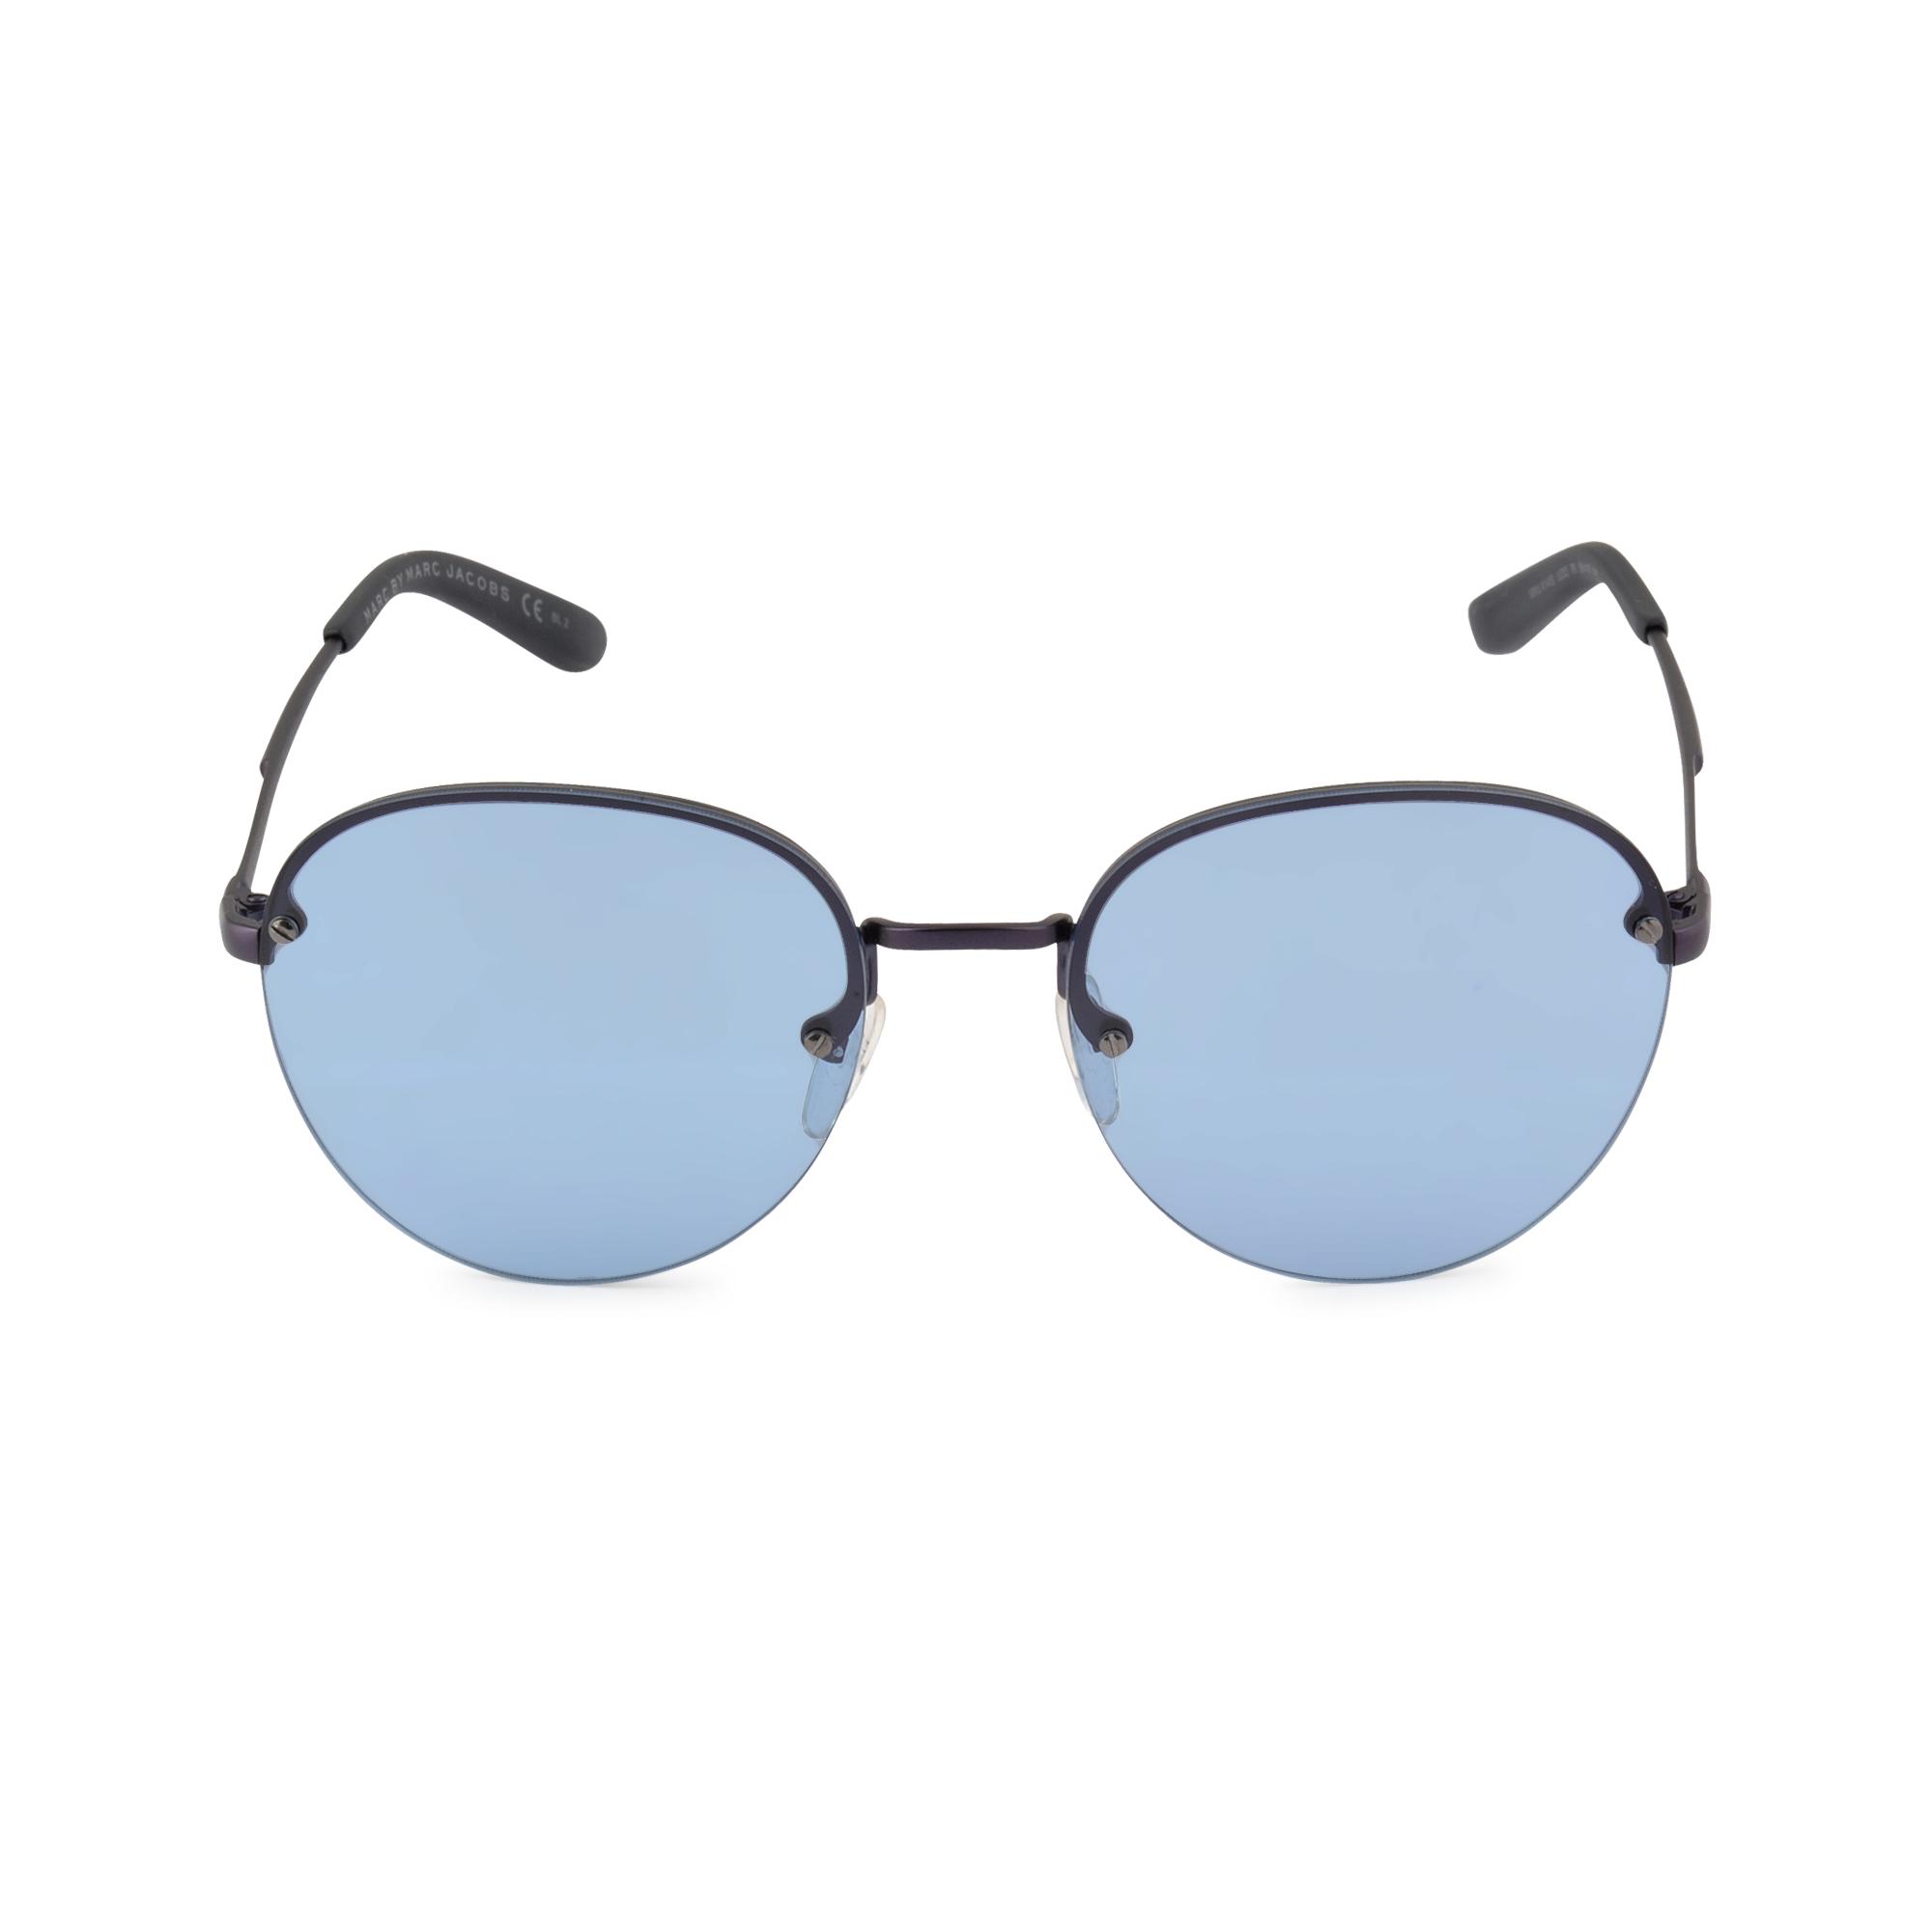 para Gafas de Mmj414s Jacobs Marc By redondas sol mujer Yr6OxnY